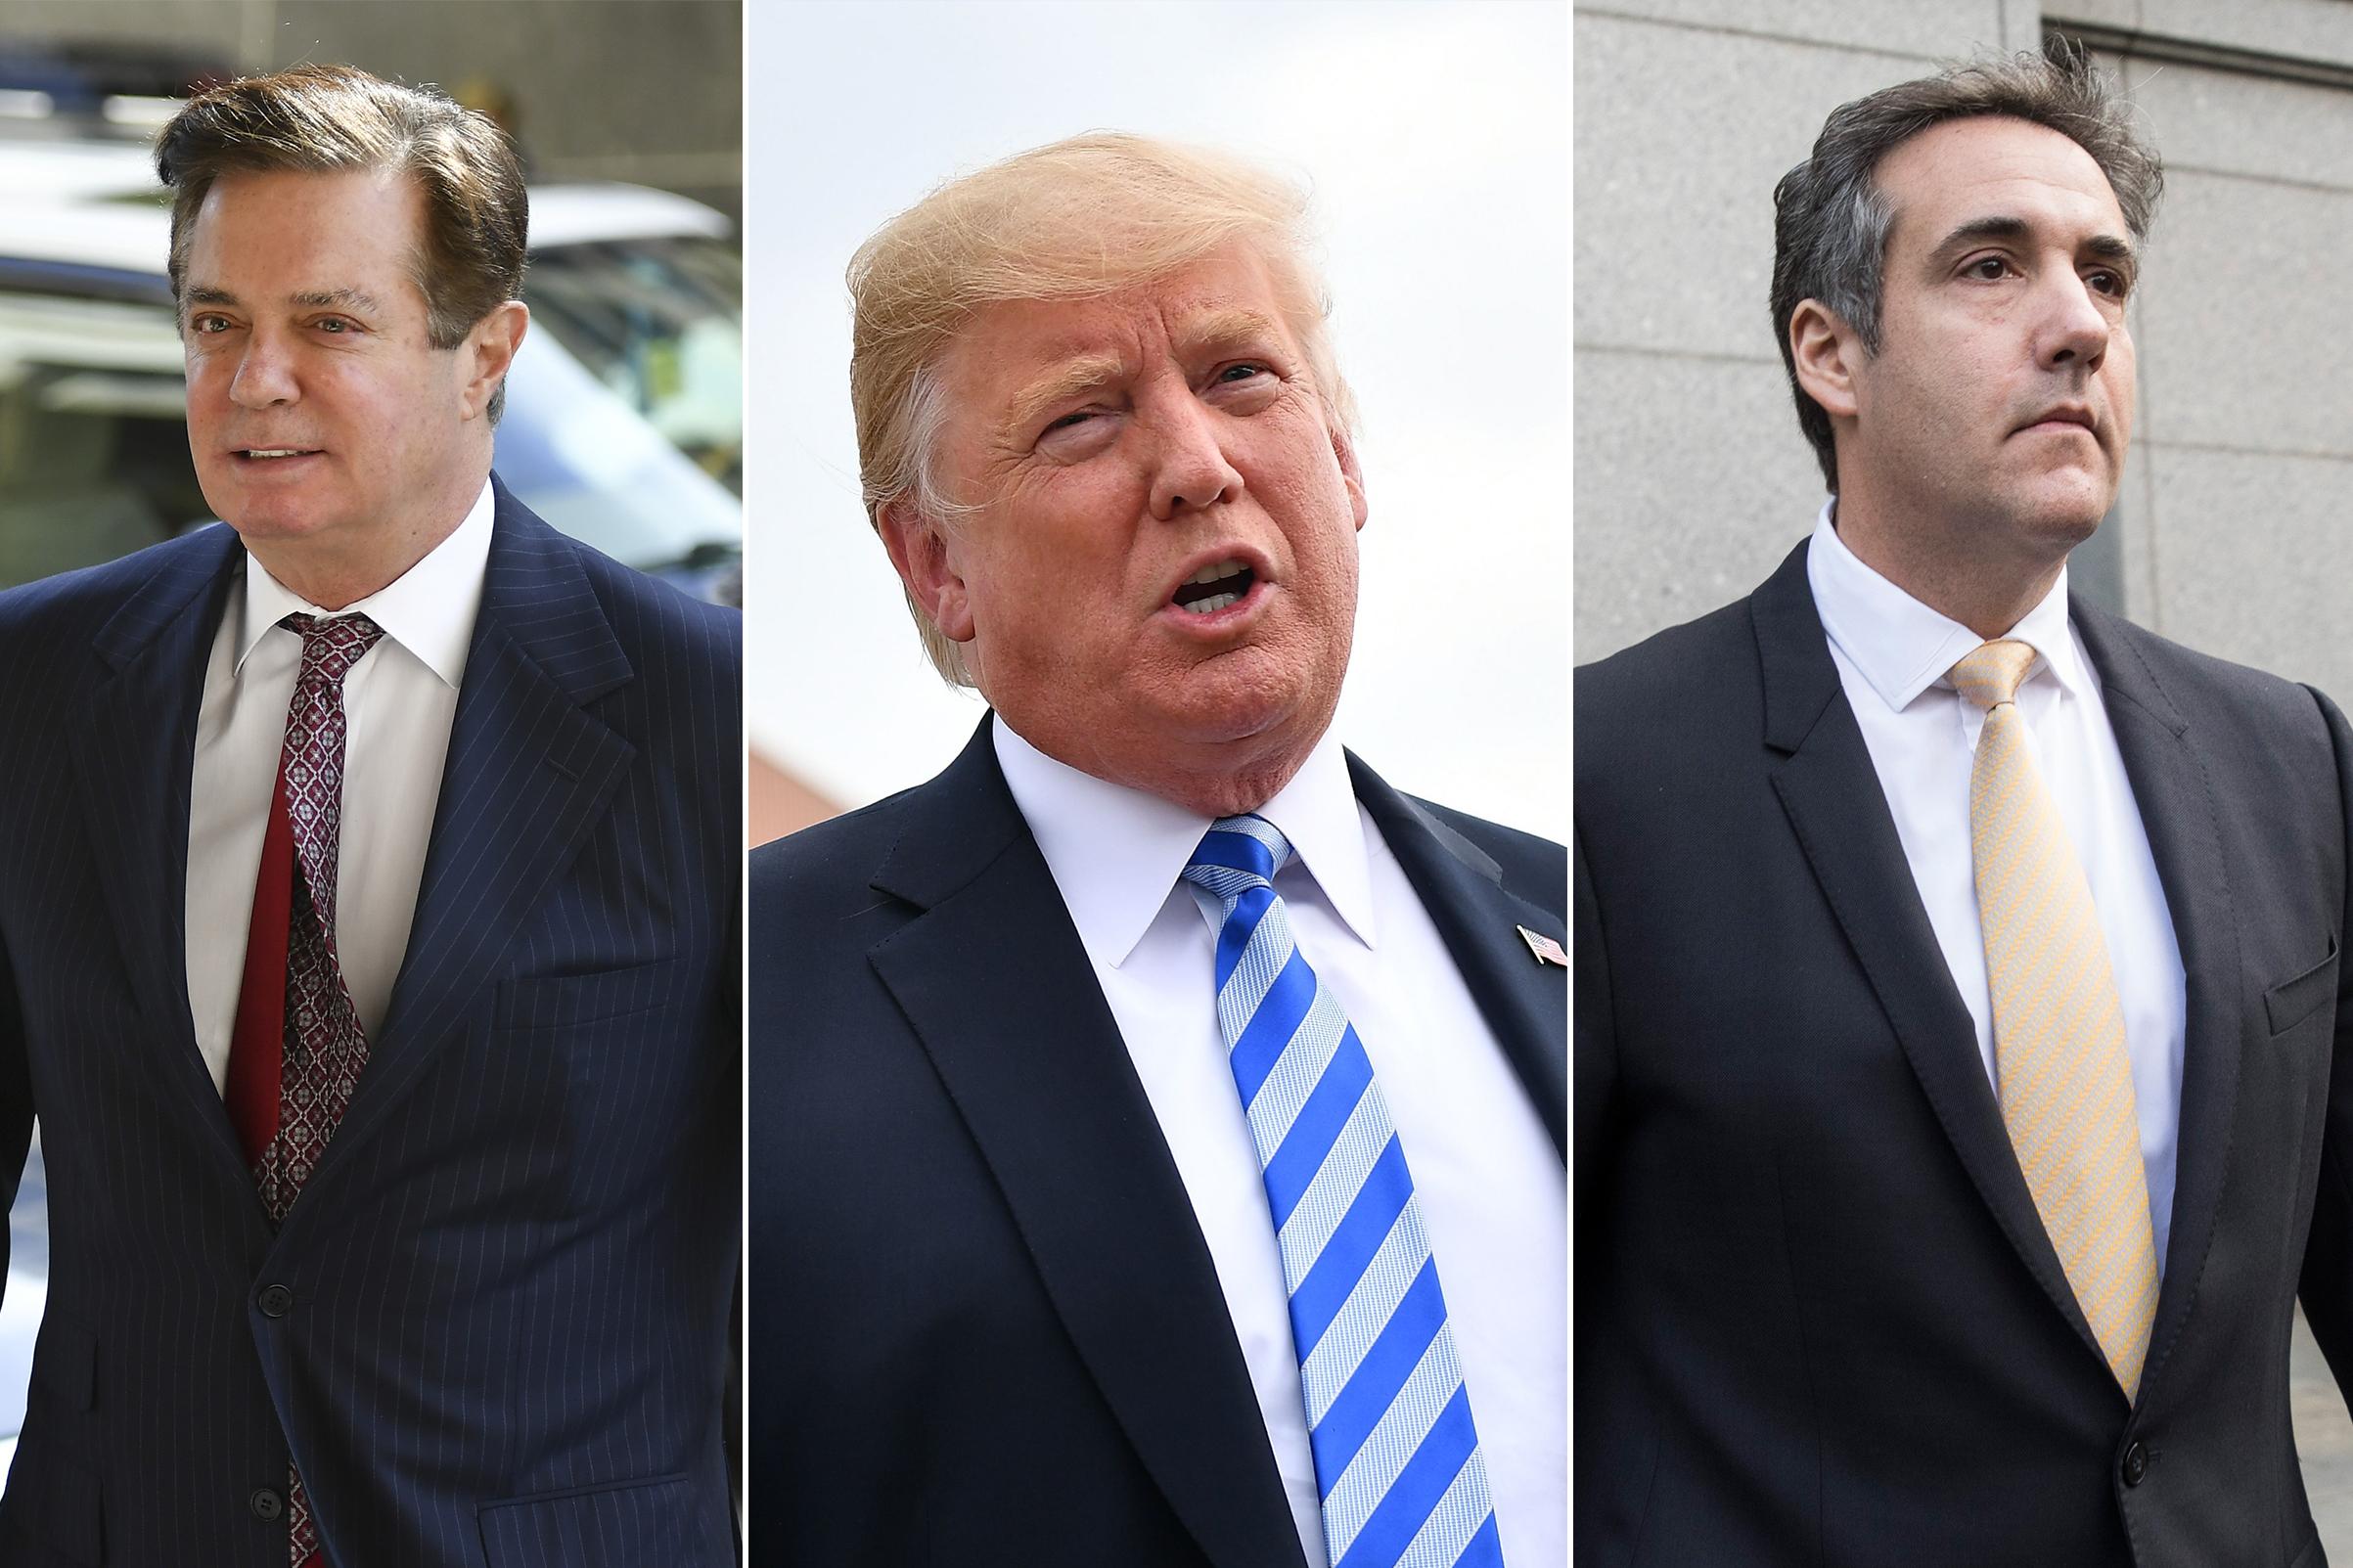 Paul Manafort, President Donald Trump and Michael Cohen